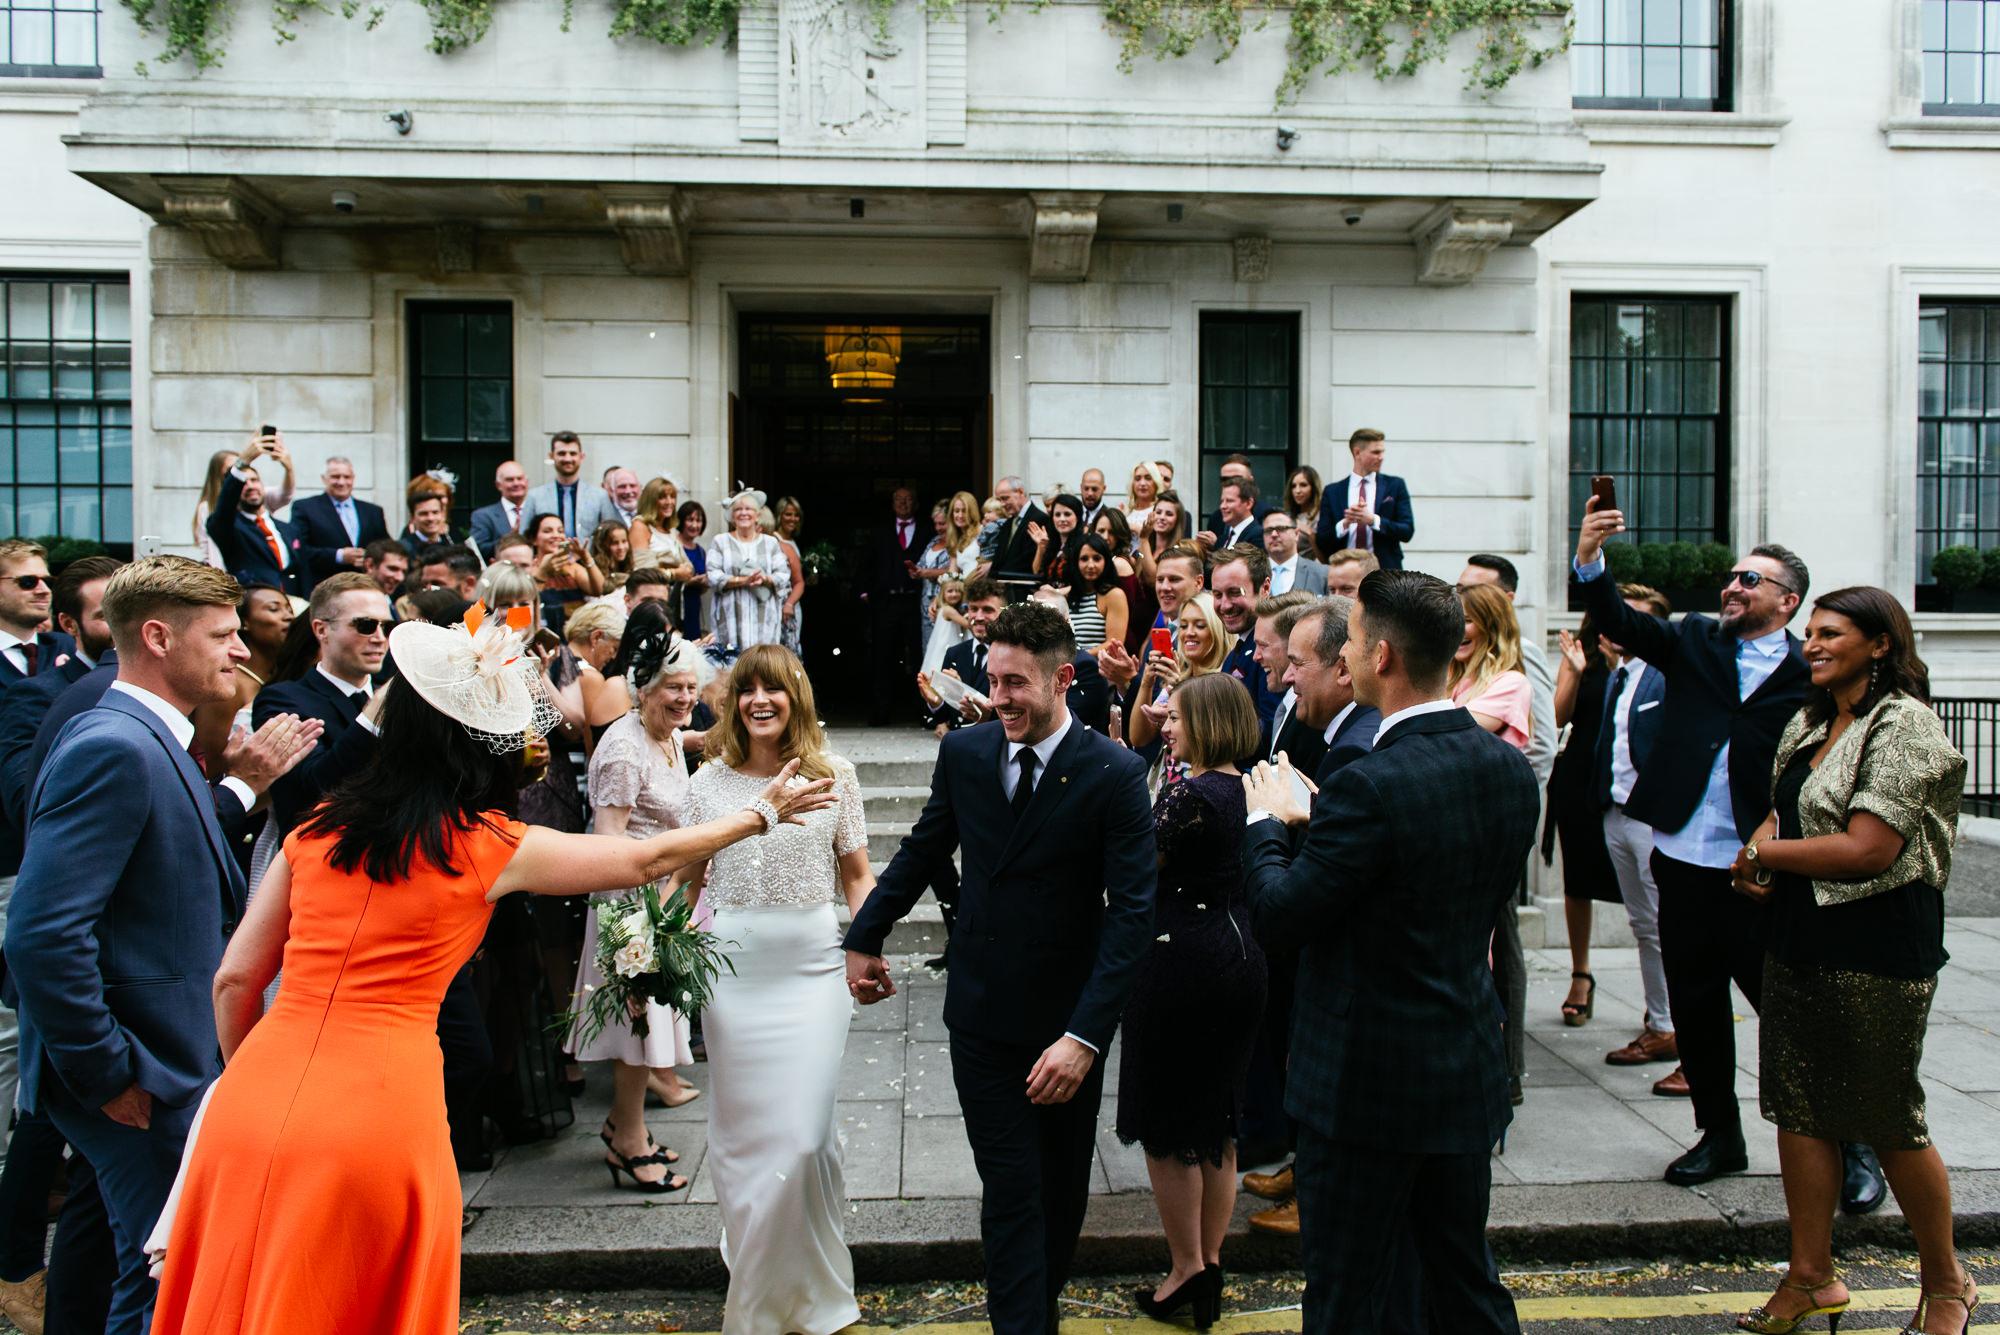 town-hall-hotel-london-wedding-45